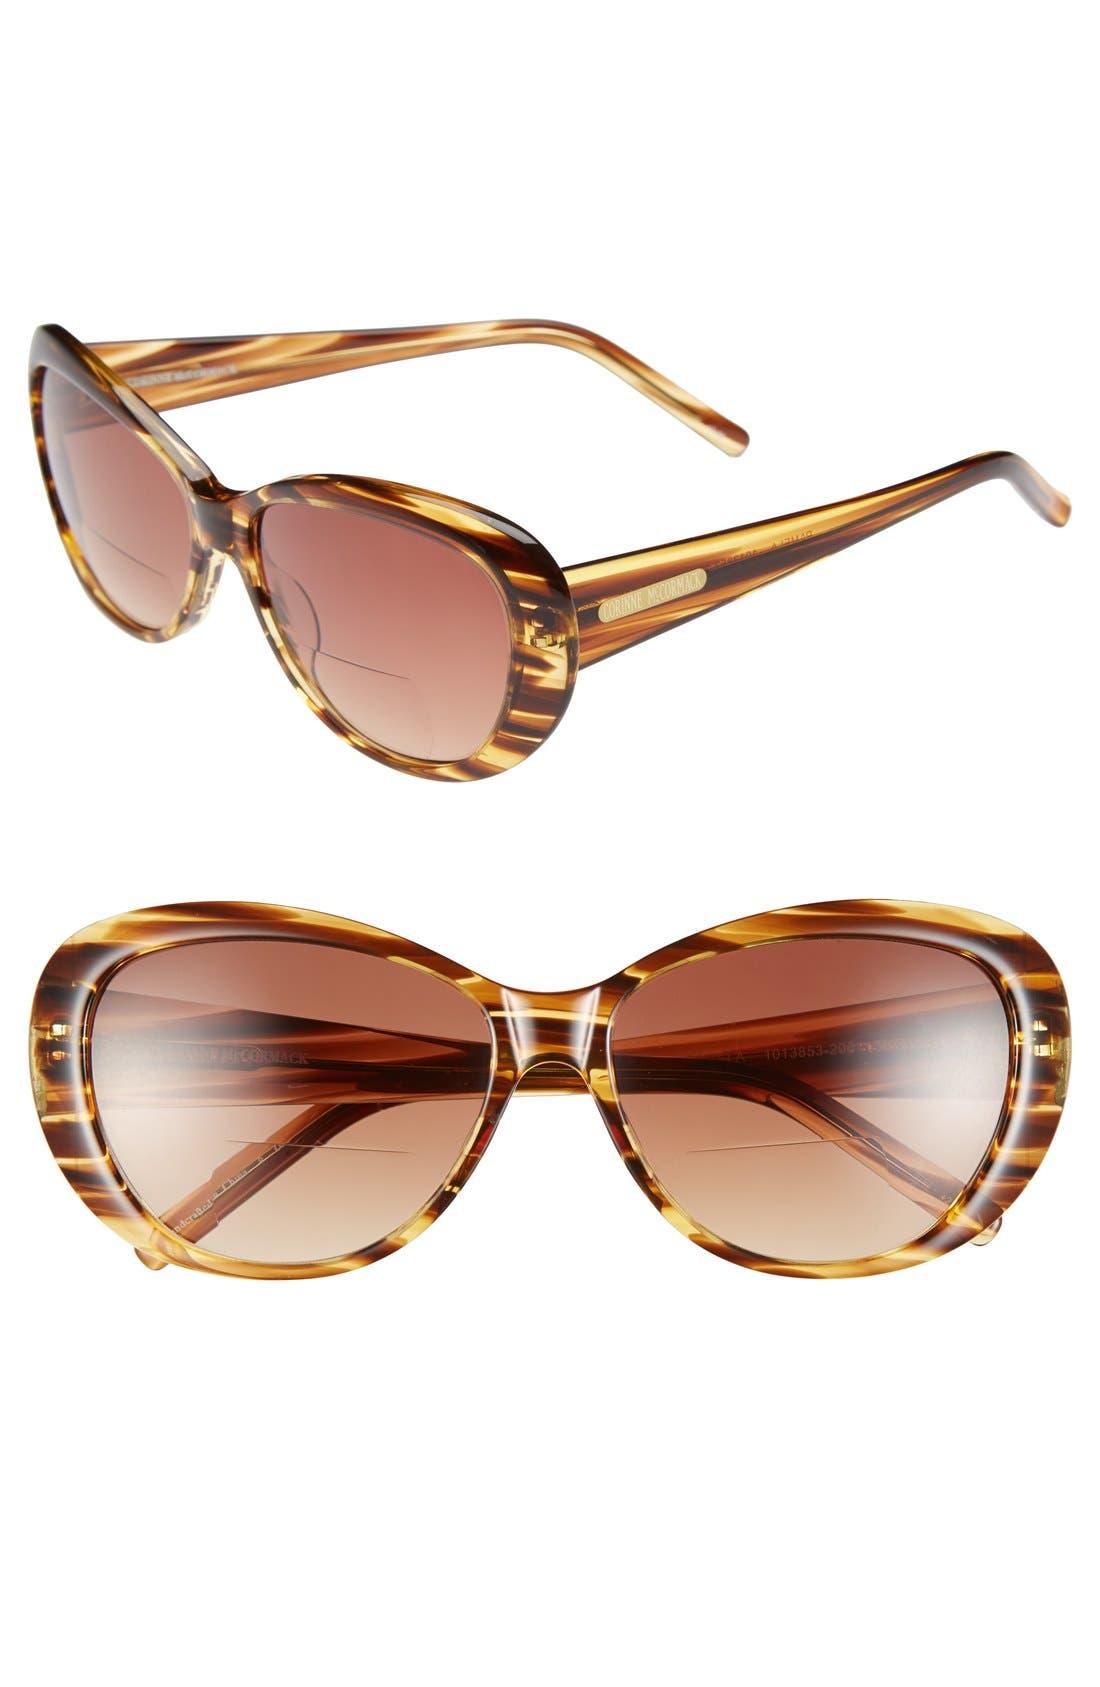 Alternate Image 1 Selected - Corinne McCormack 'Pamela' 56mm Reading Sunglasses